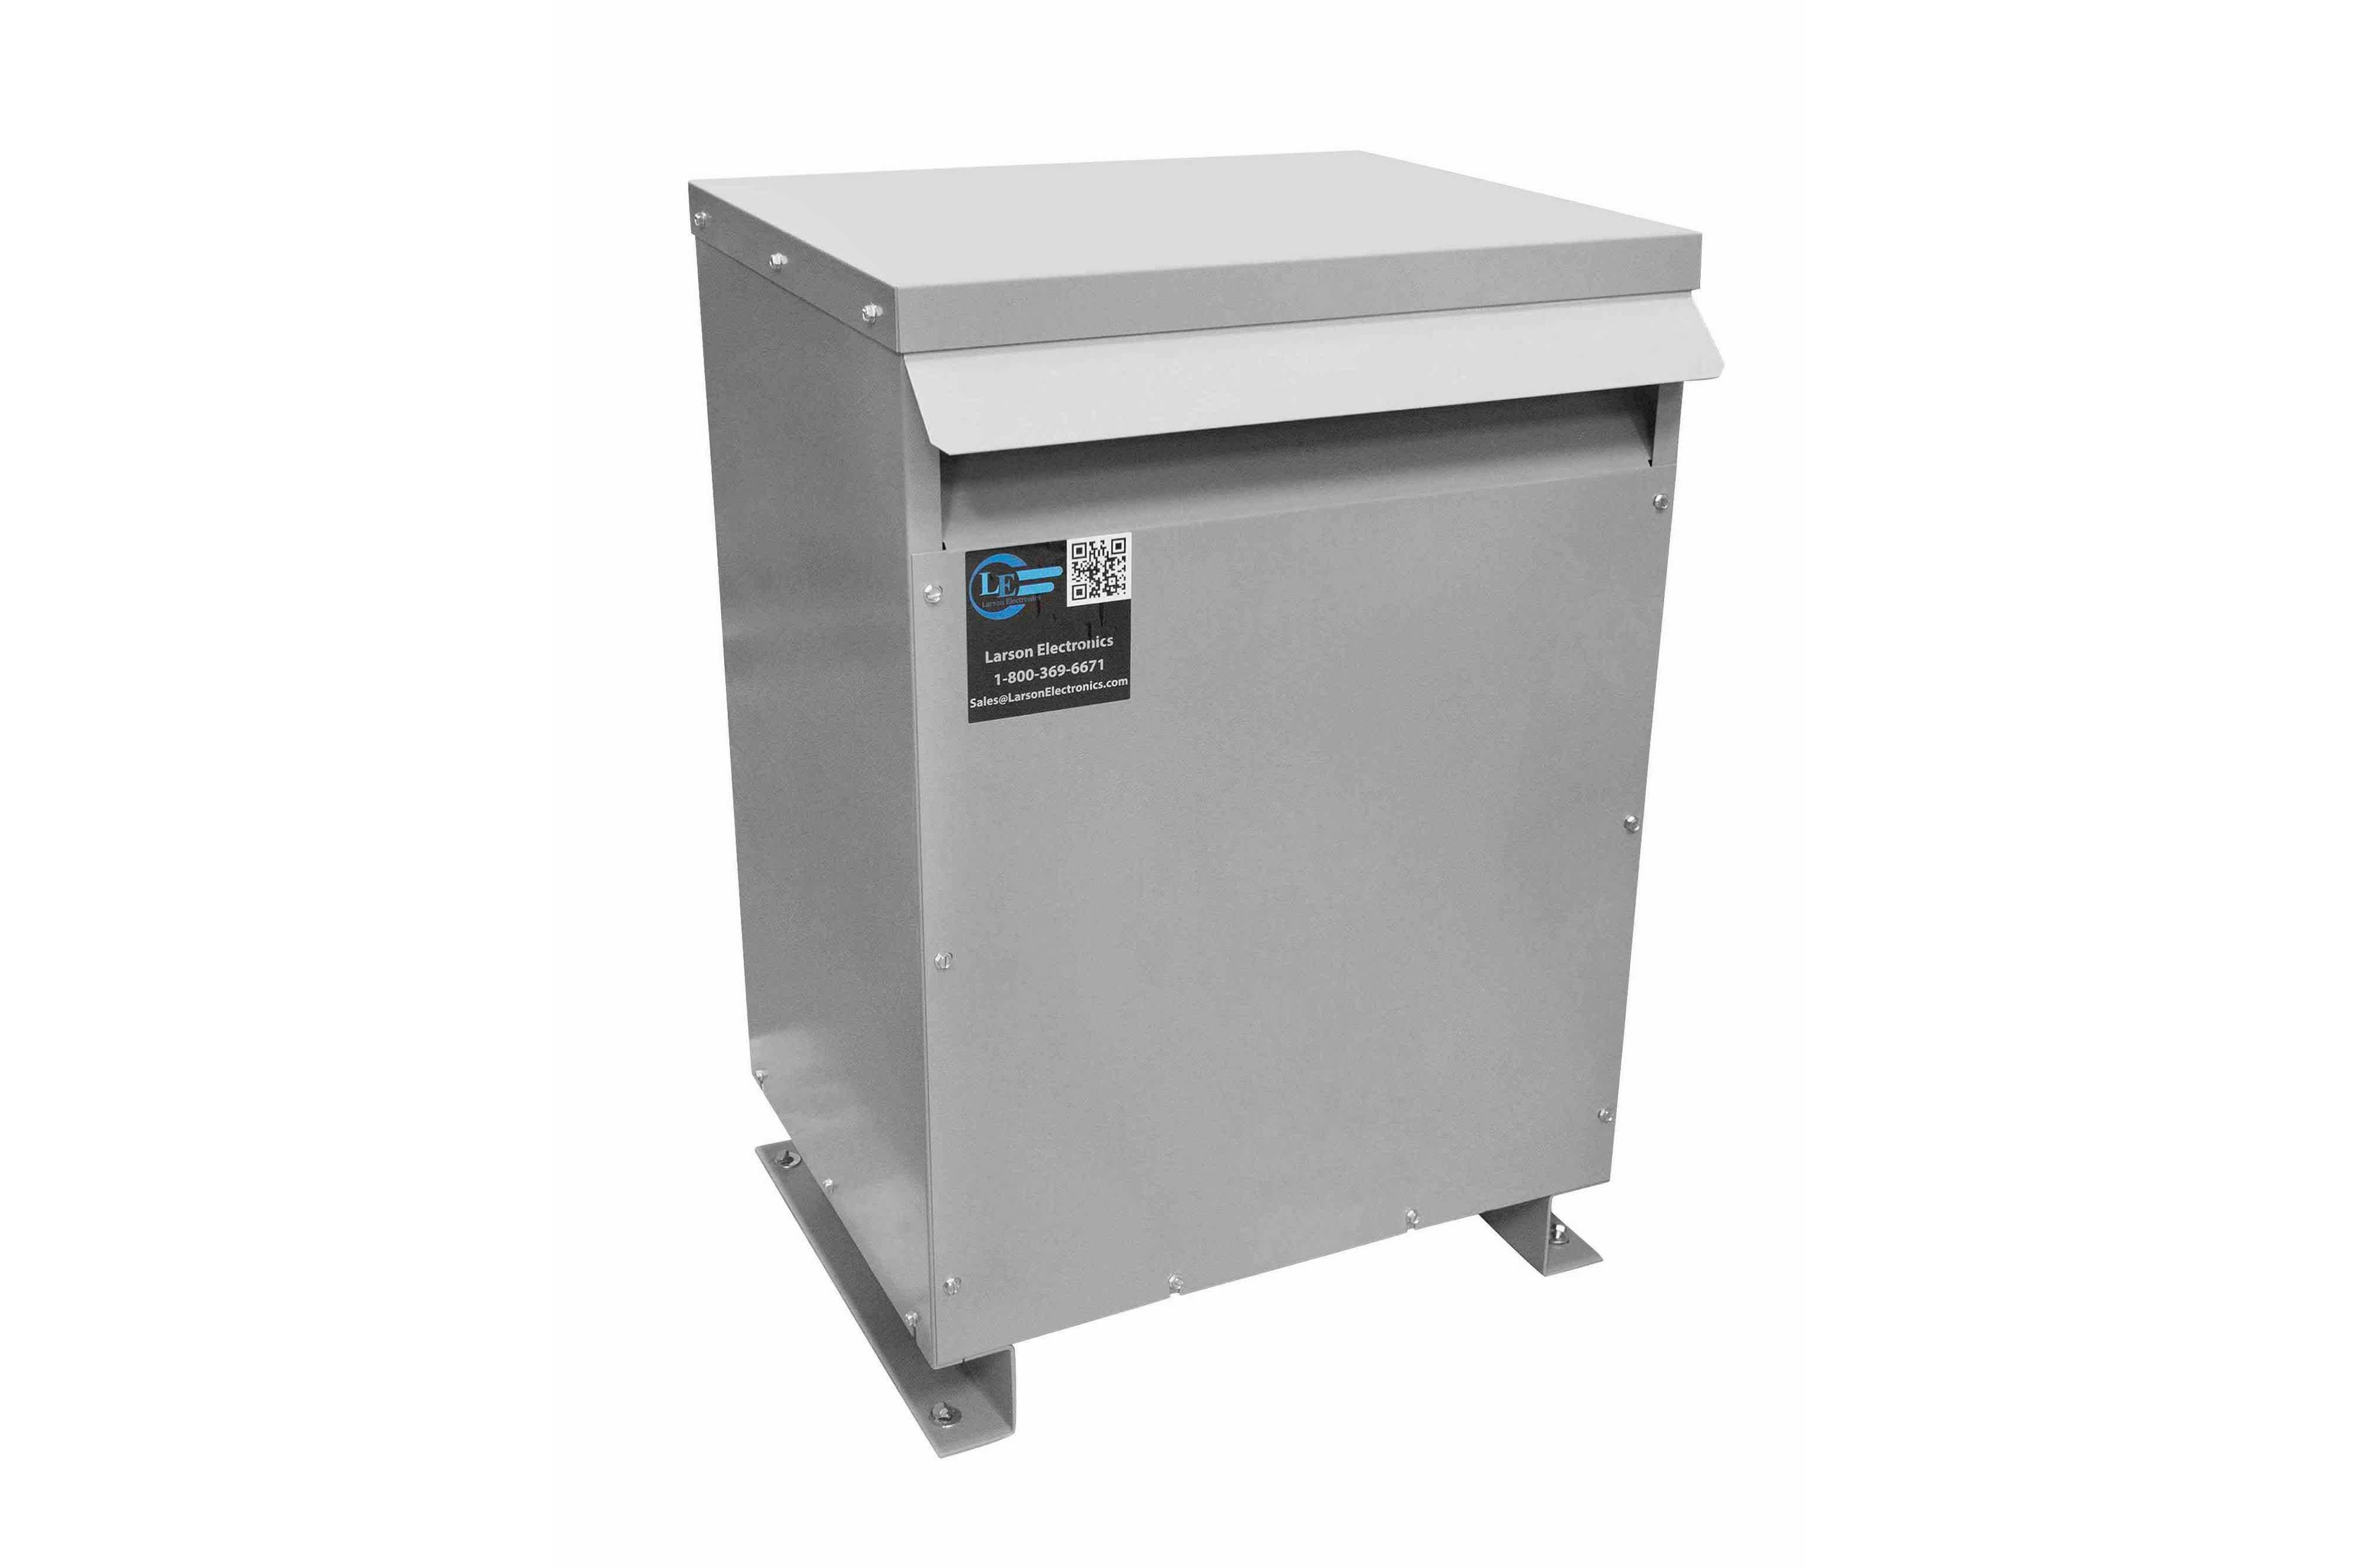 167 kVA 3PH DOE Transformer, 208V Delta Primary, 480Y/277 Wye-N Secondary, N3R, Ventilated, 60 Hz